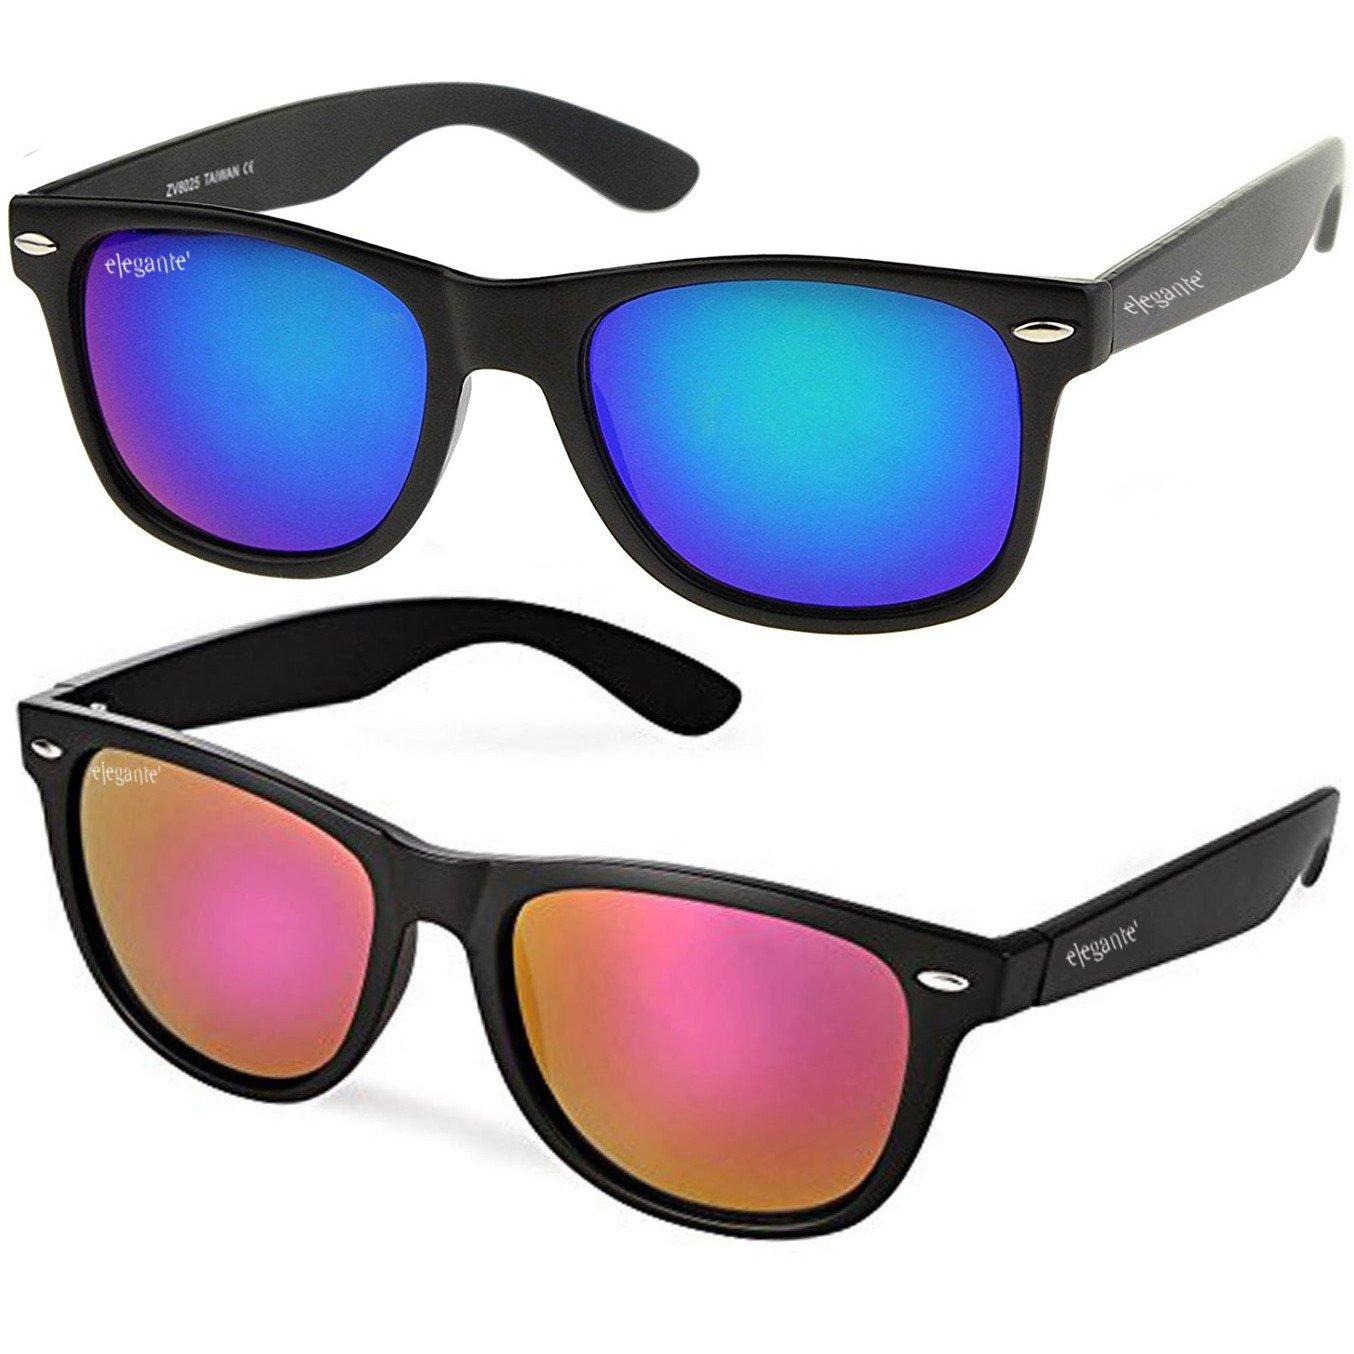 f31edd60c66 Elegante combo of uv protected purple blue mirrored wayfarer jpg 1354x1354 Mirrored  wayfarer sunglasses